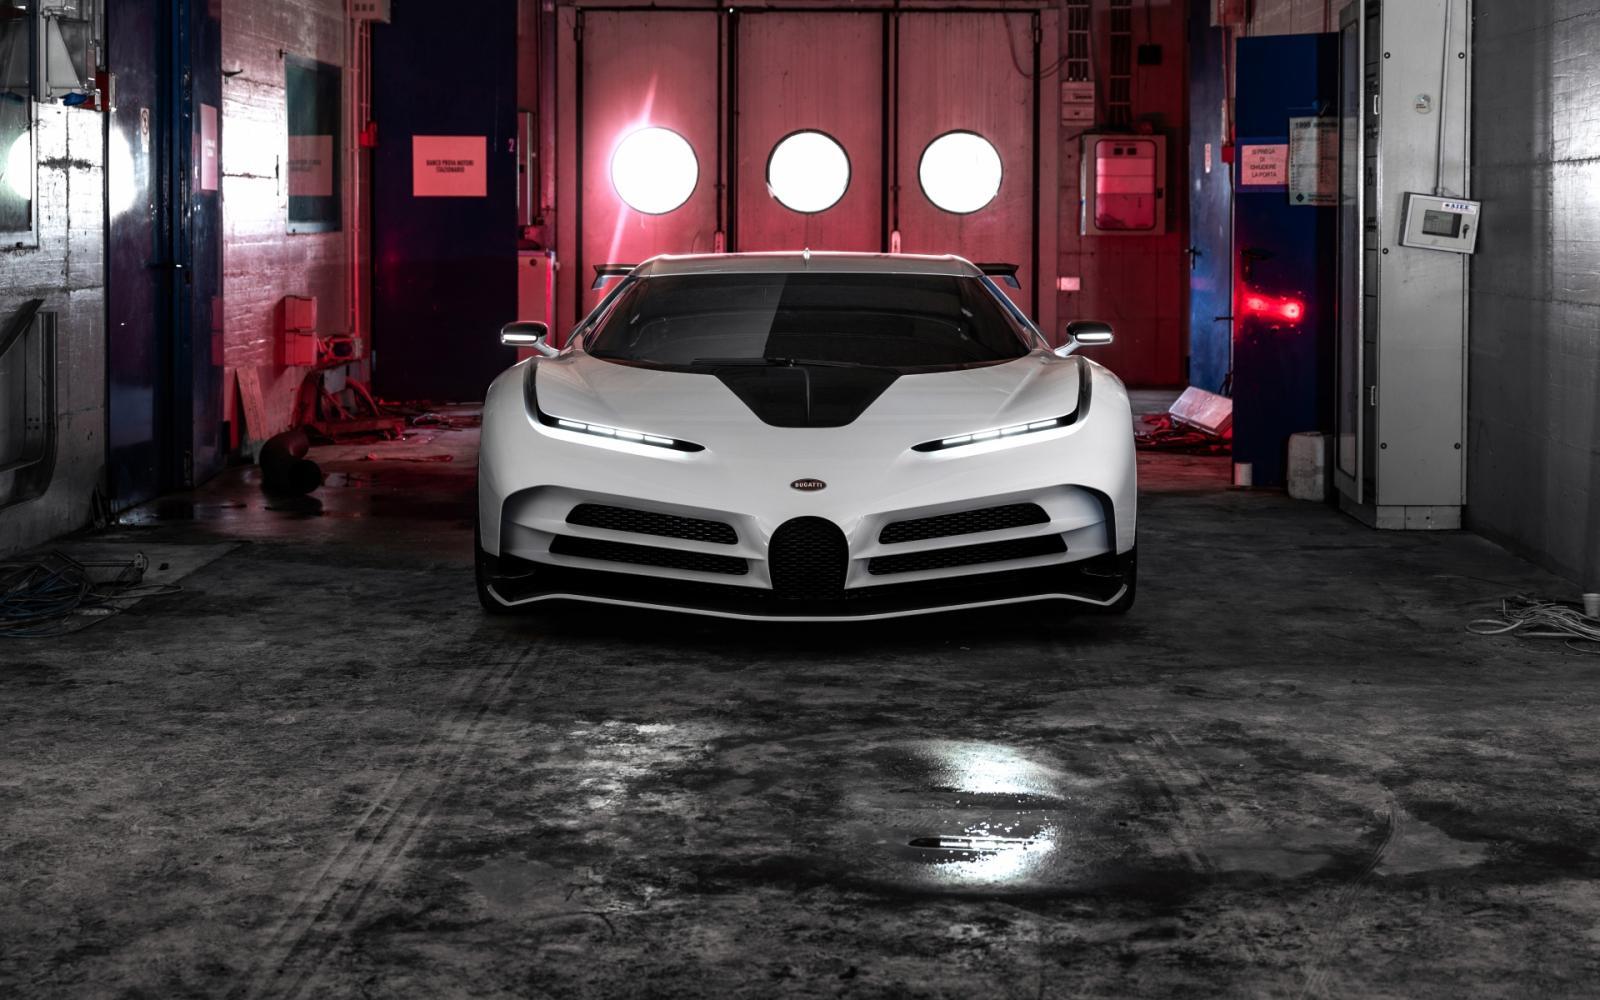 Bugatti Centodieci is sterker, maar langzamer dan een Chiron